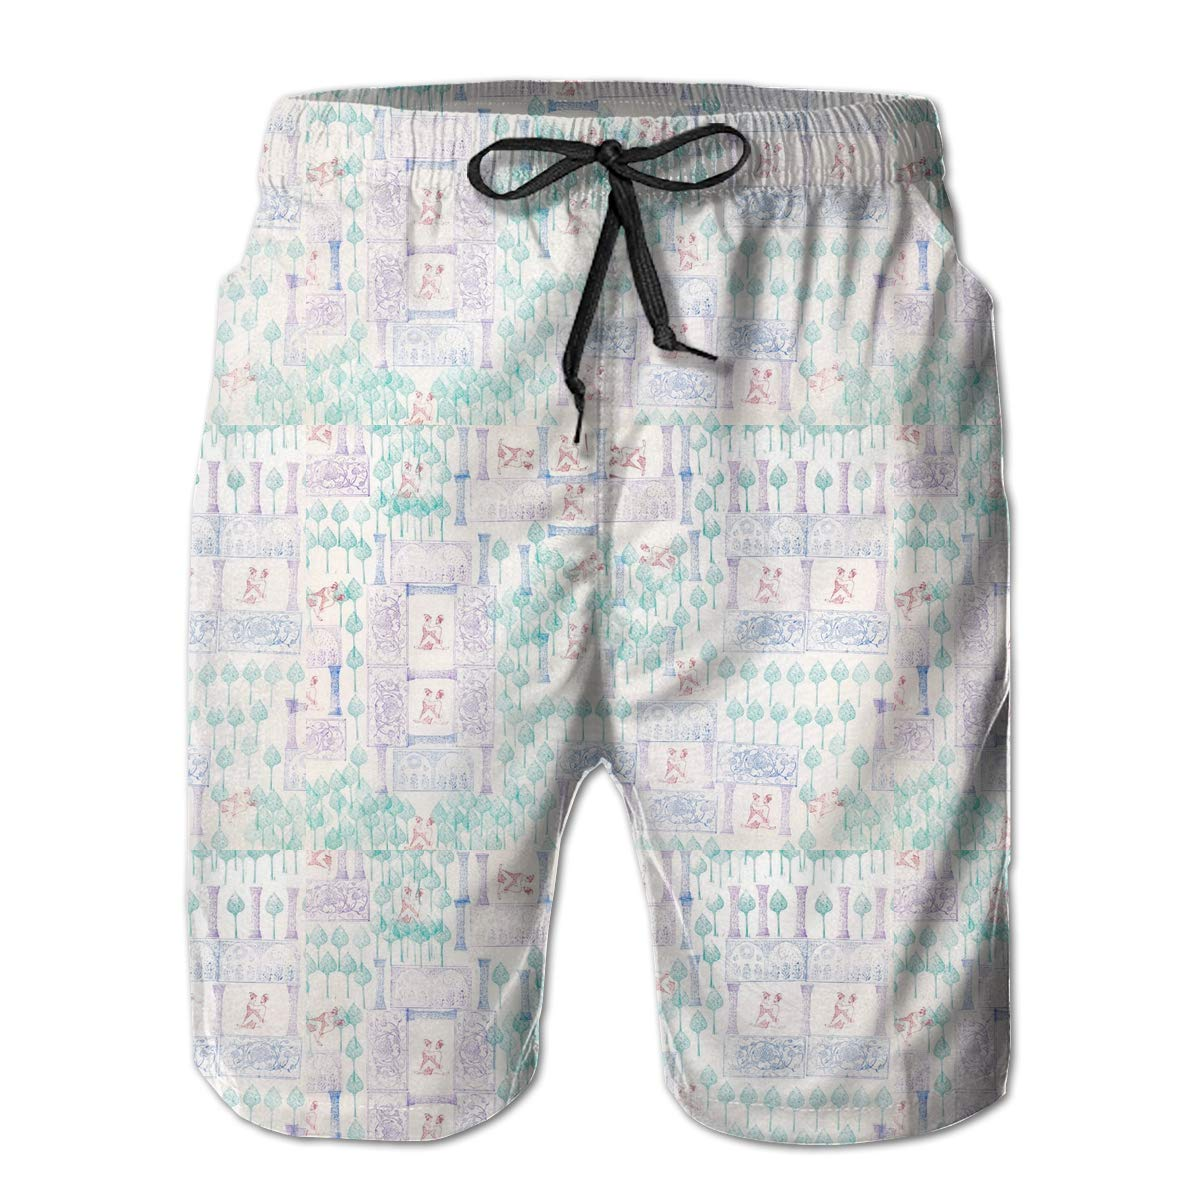 SACVCCD Mens Swim Trunks with Mesh Lining Pockets Tree People Boys Polyester Board Shorts Swimwear